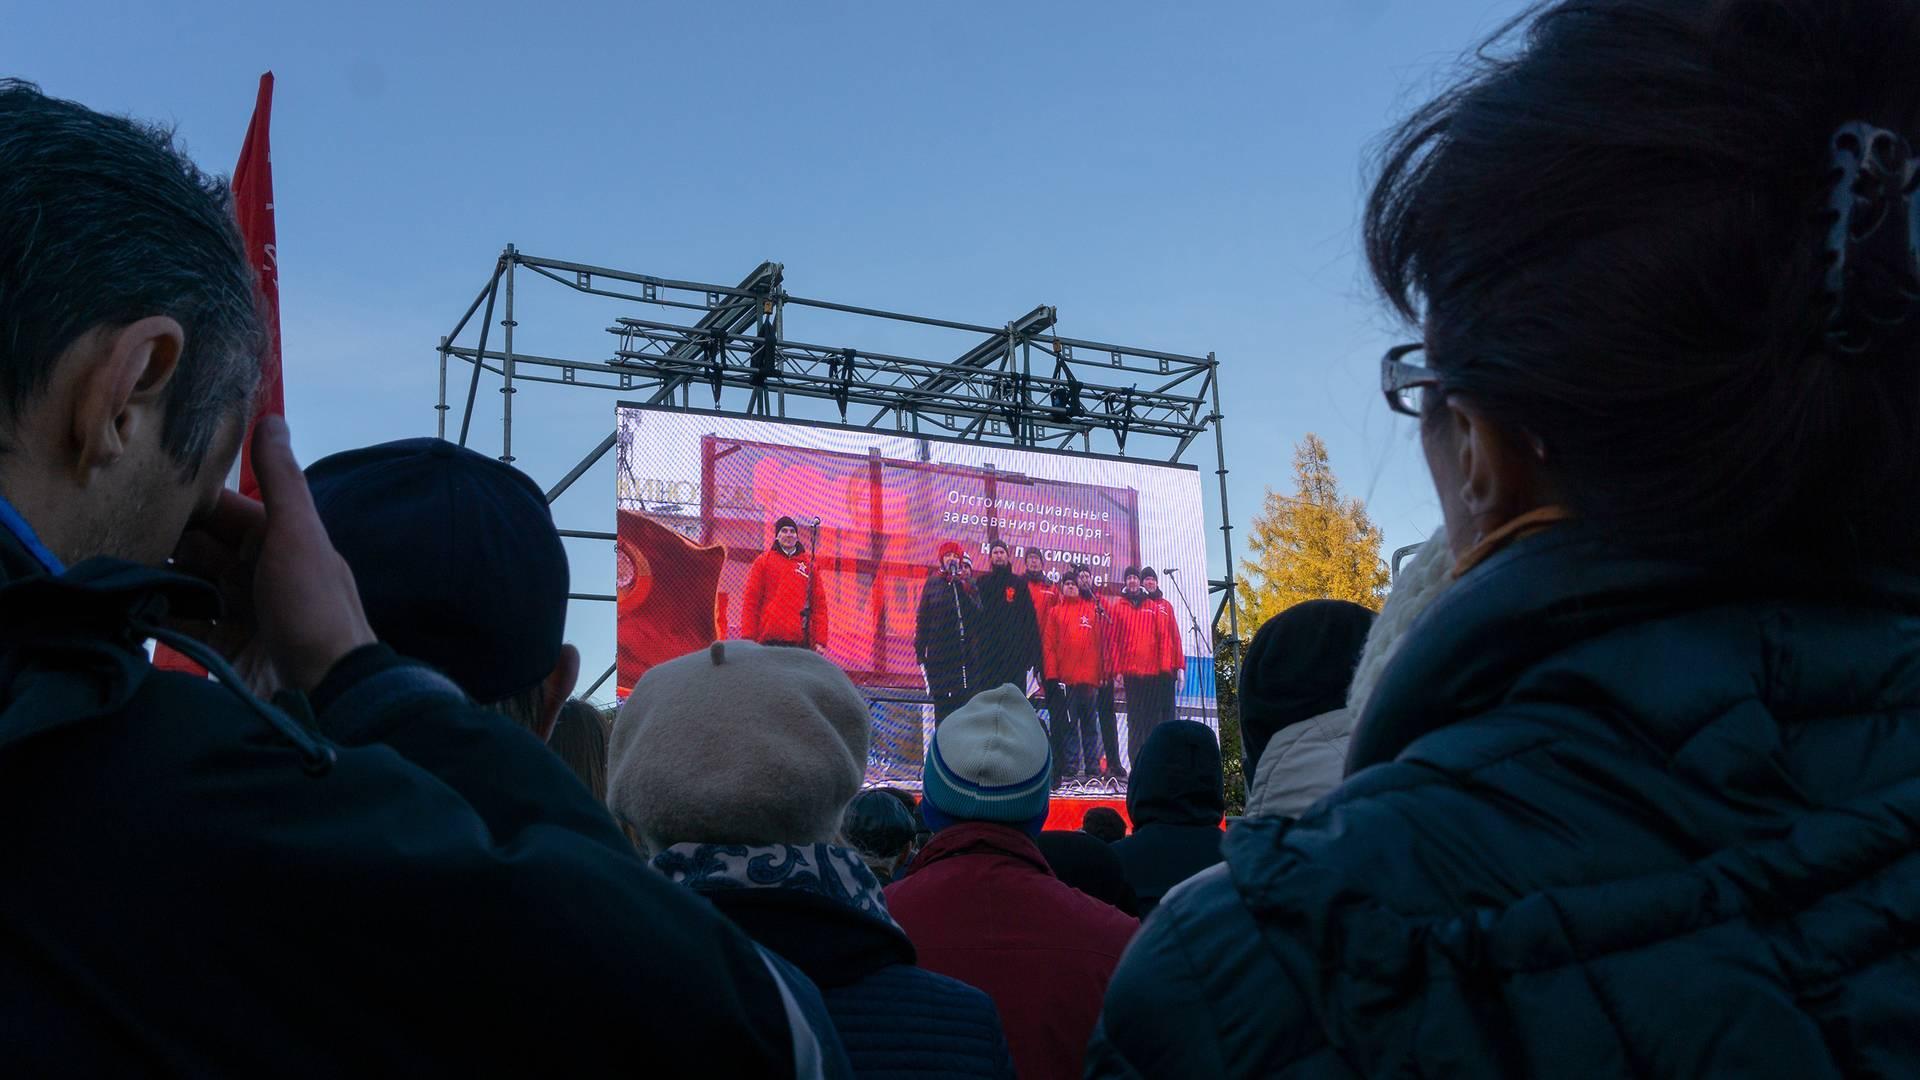 Приветствие митингу «Сути времени» из Бердска. Москва, 5 ноября 2018 г.